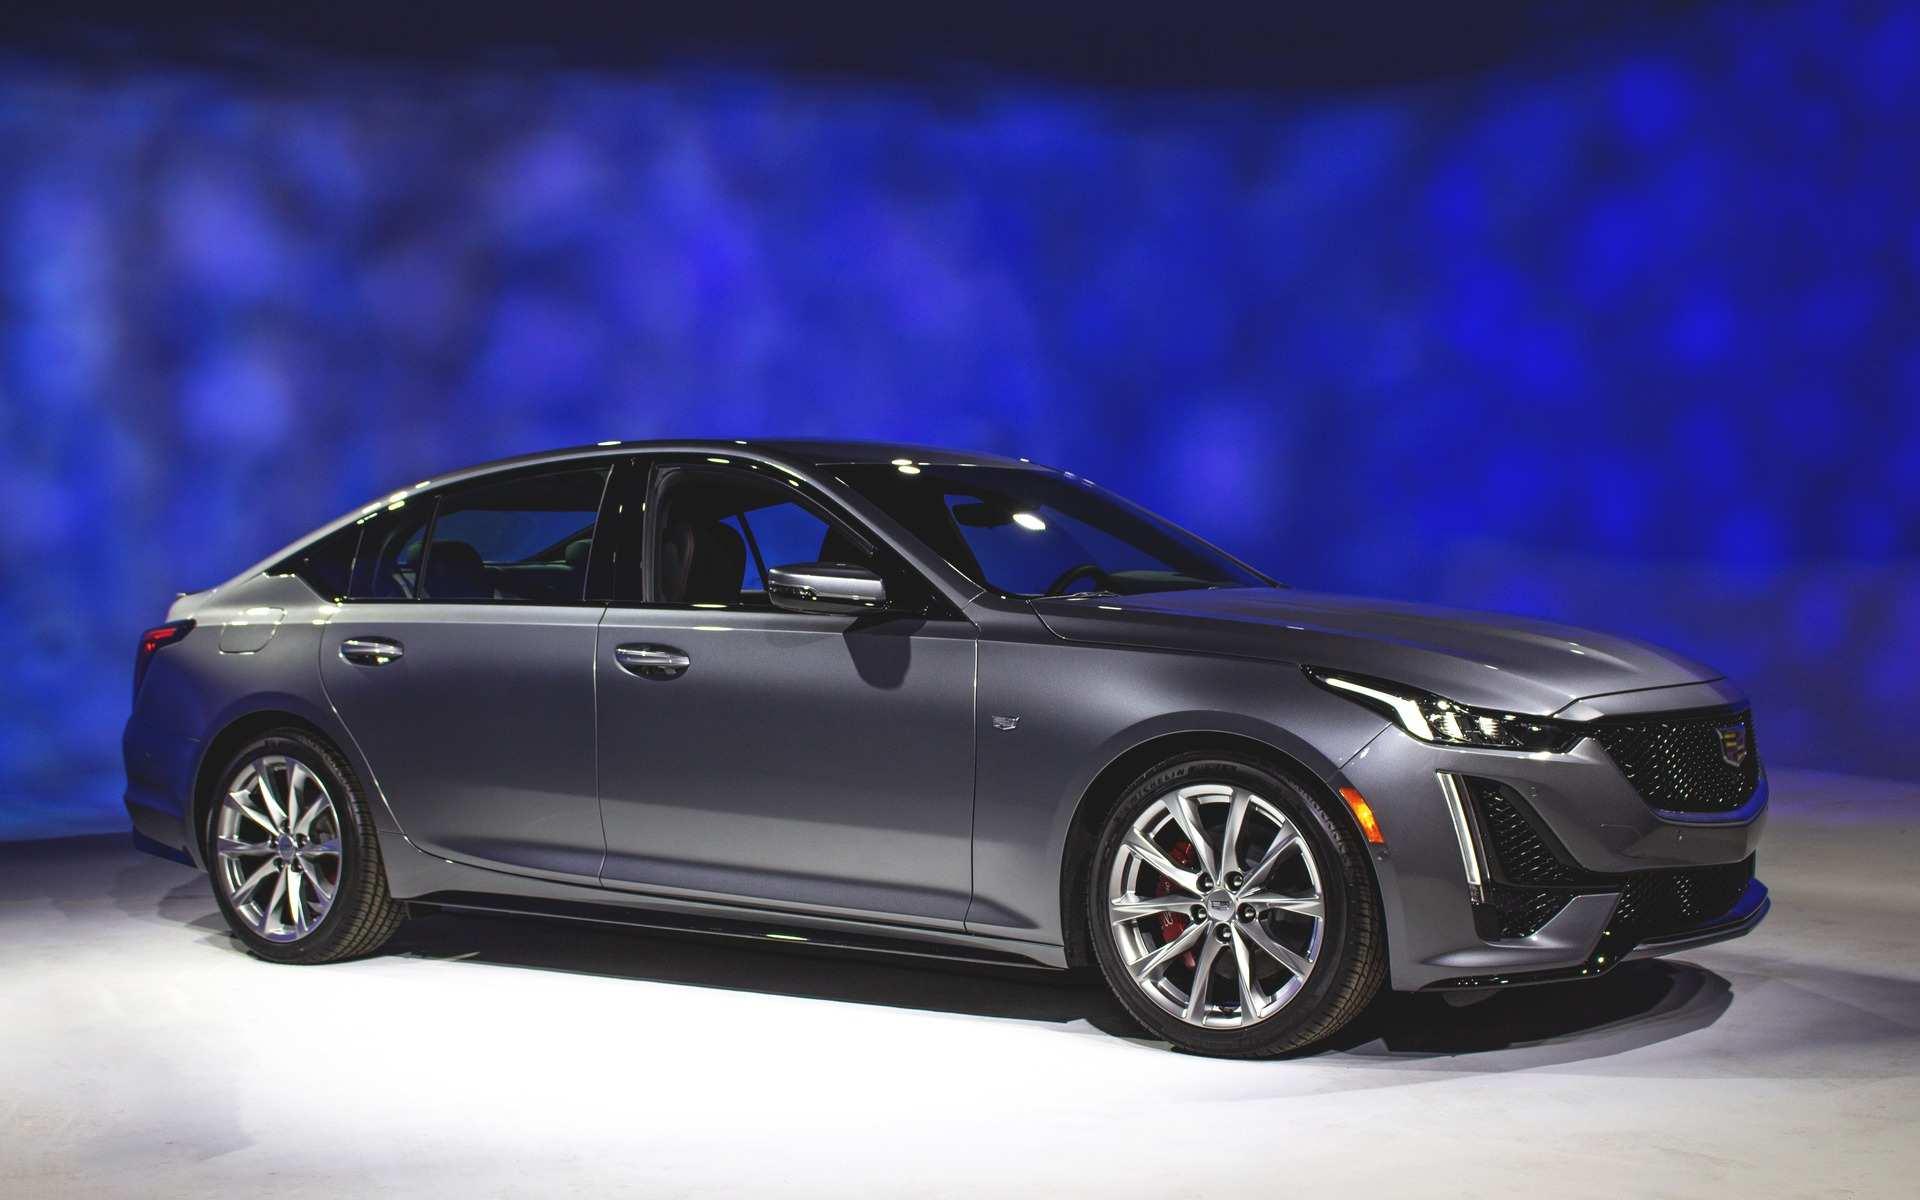 37 New Cadillac Ct5 2020 Model by Cadillac Ct5 2020